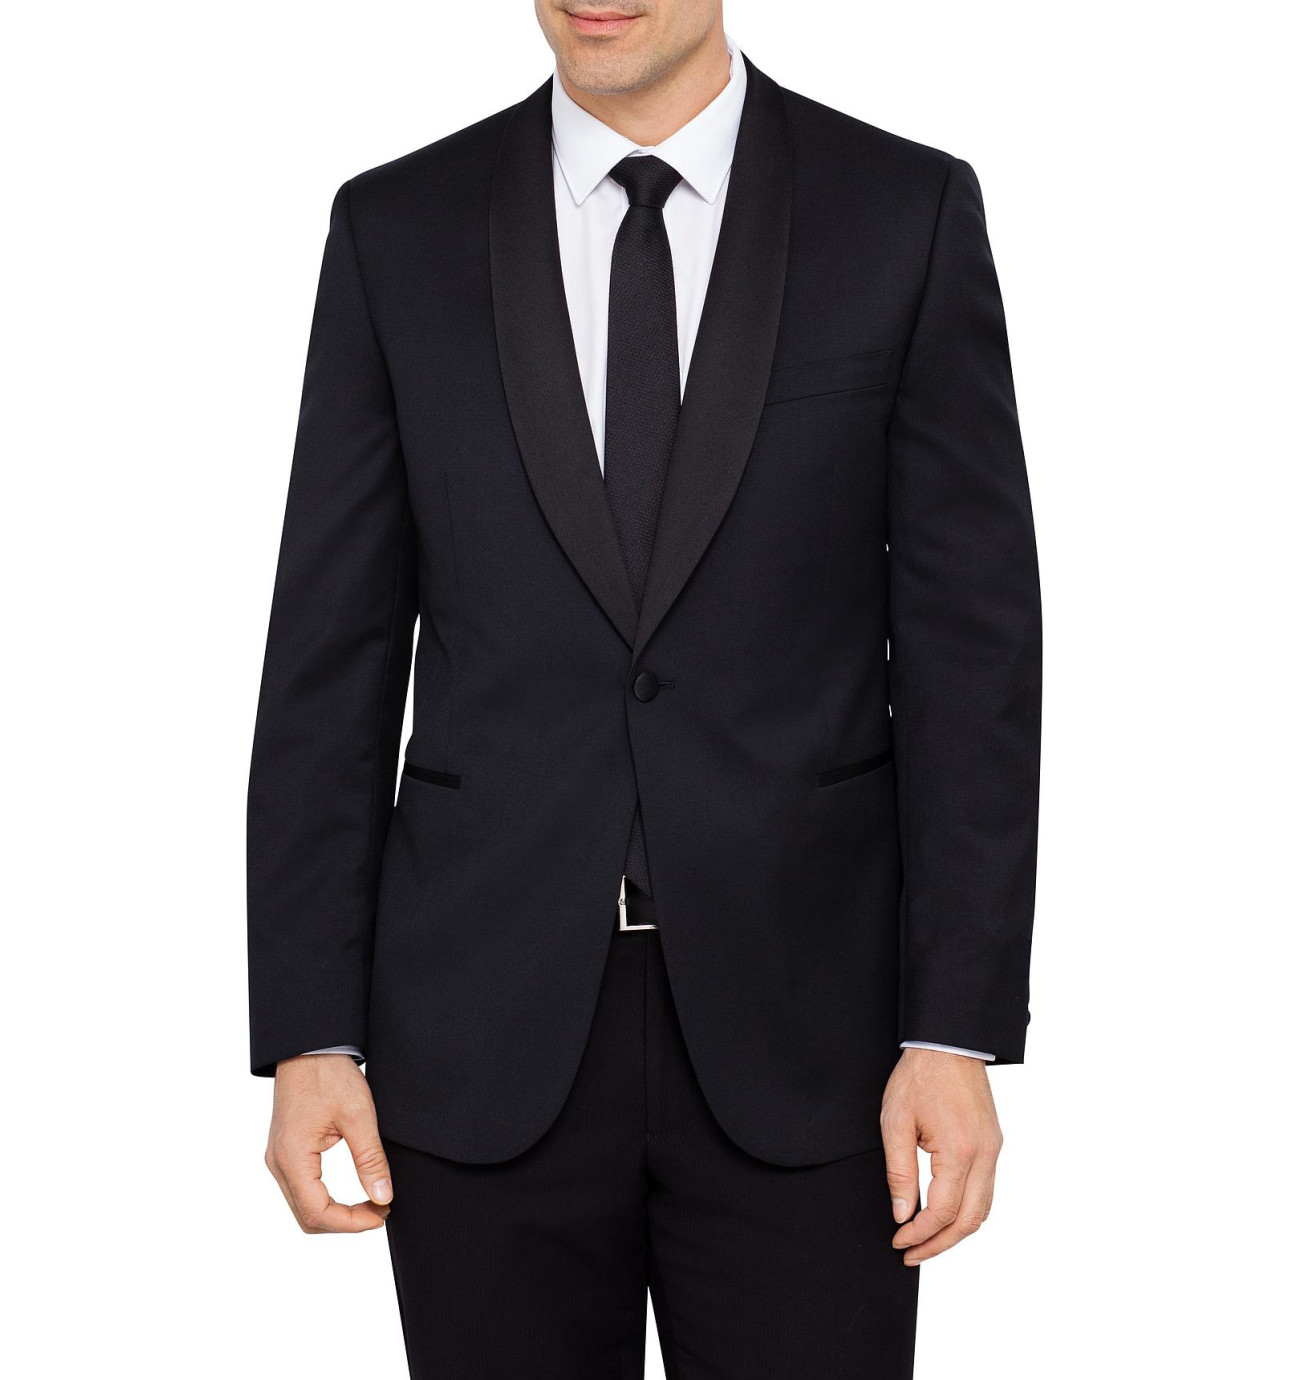 Mens jacket david jones - Savoy Tuxedo Jacket